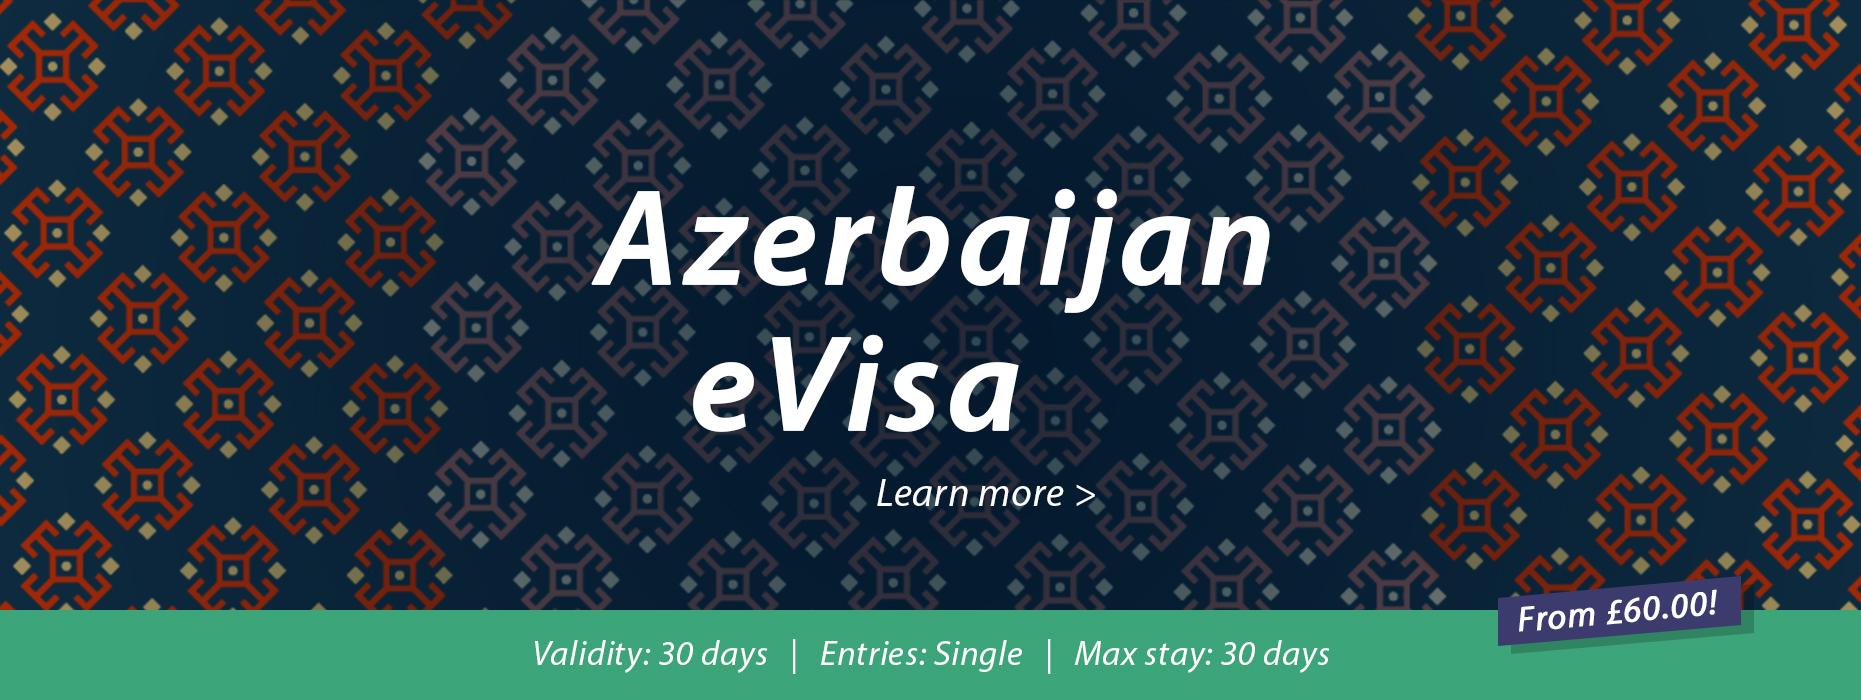 republic of turkey electronic visa application